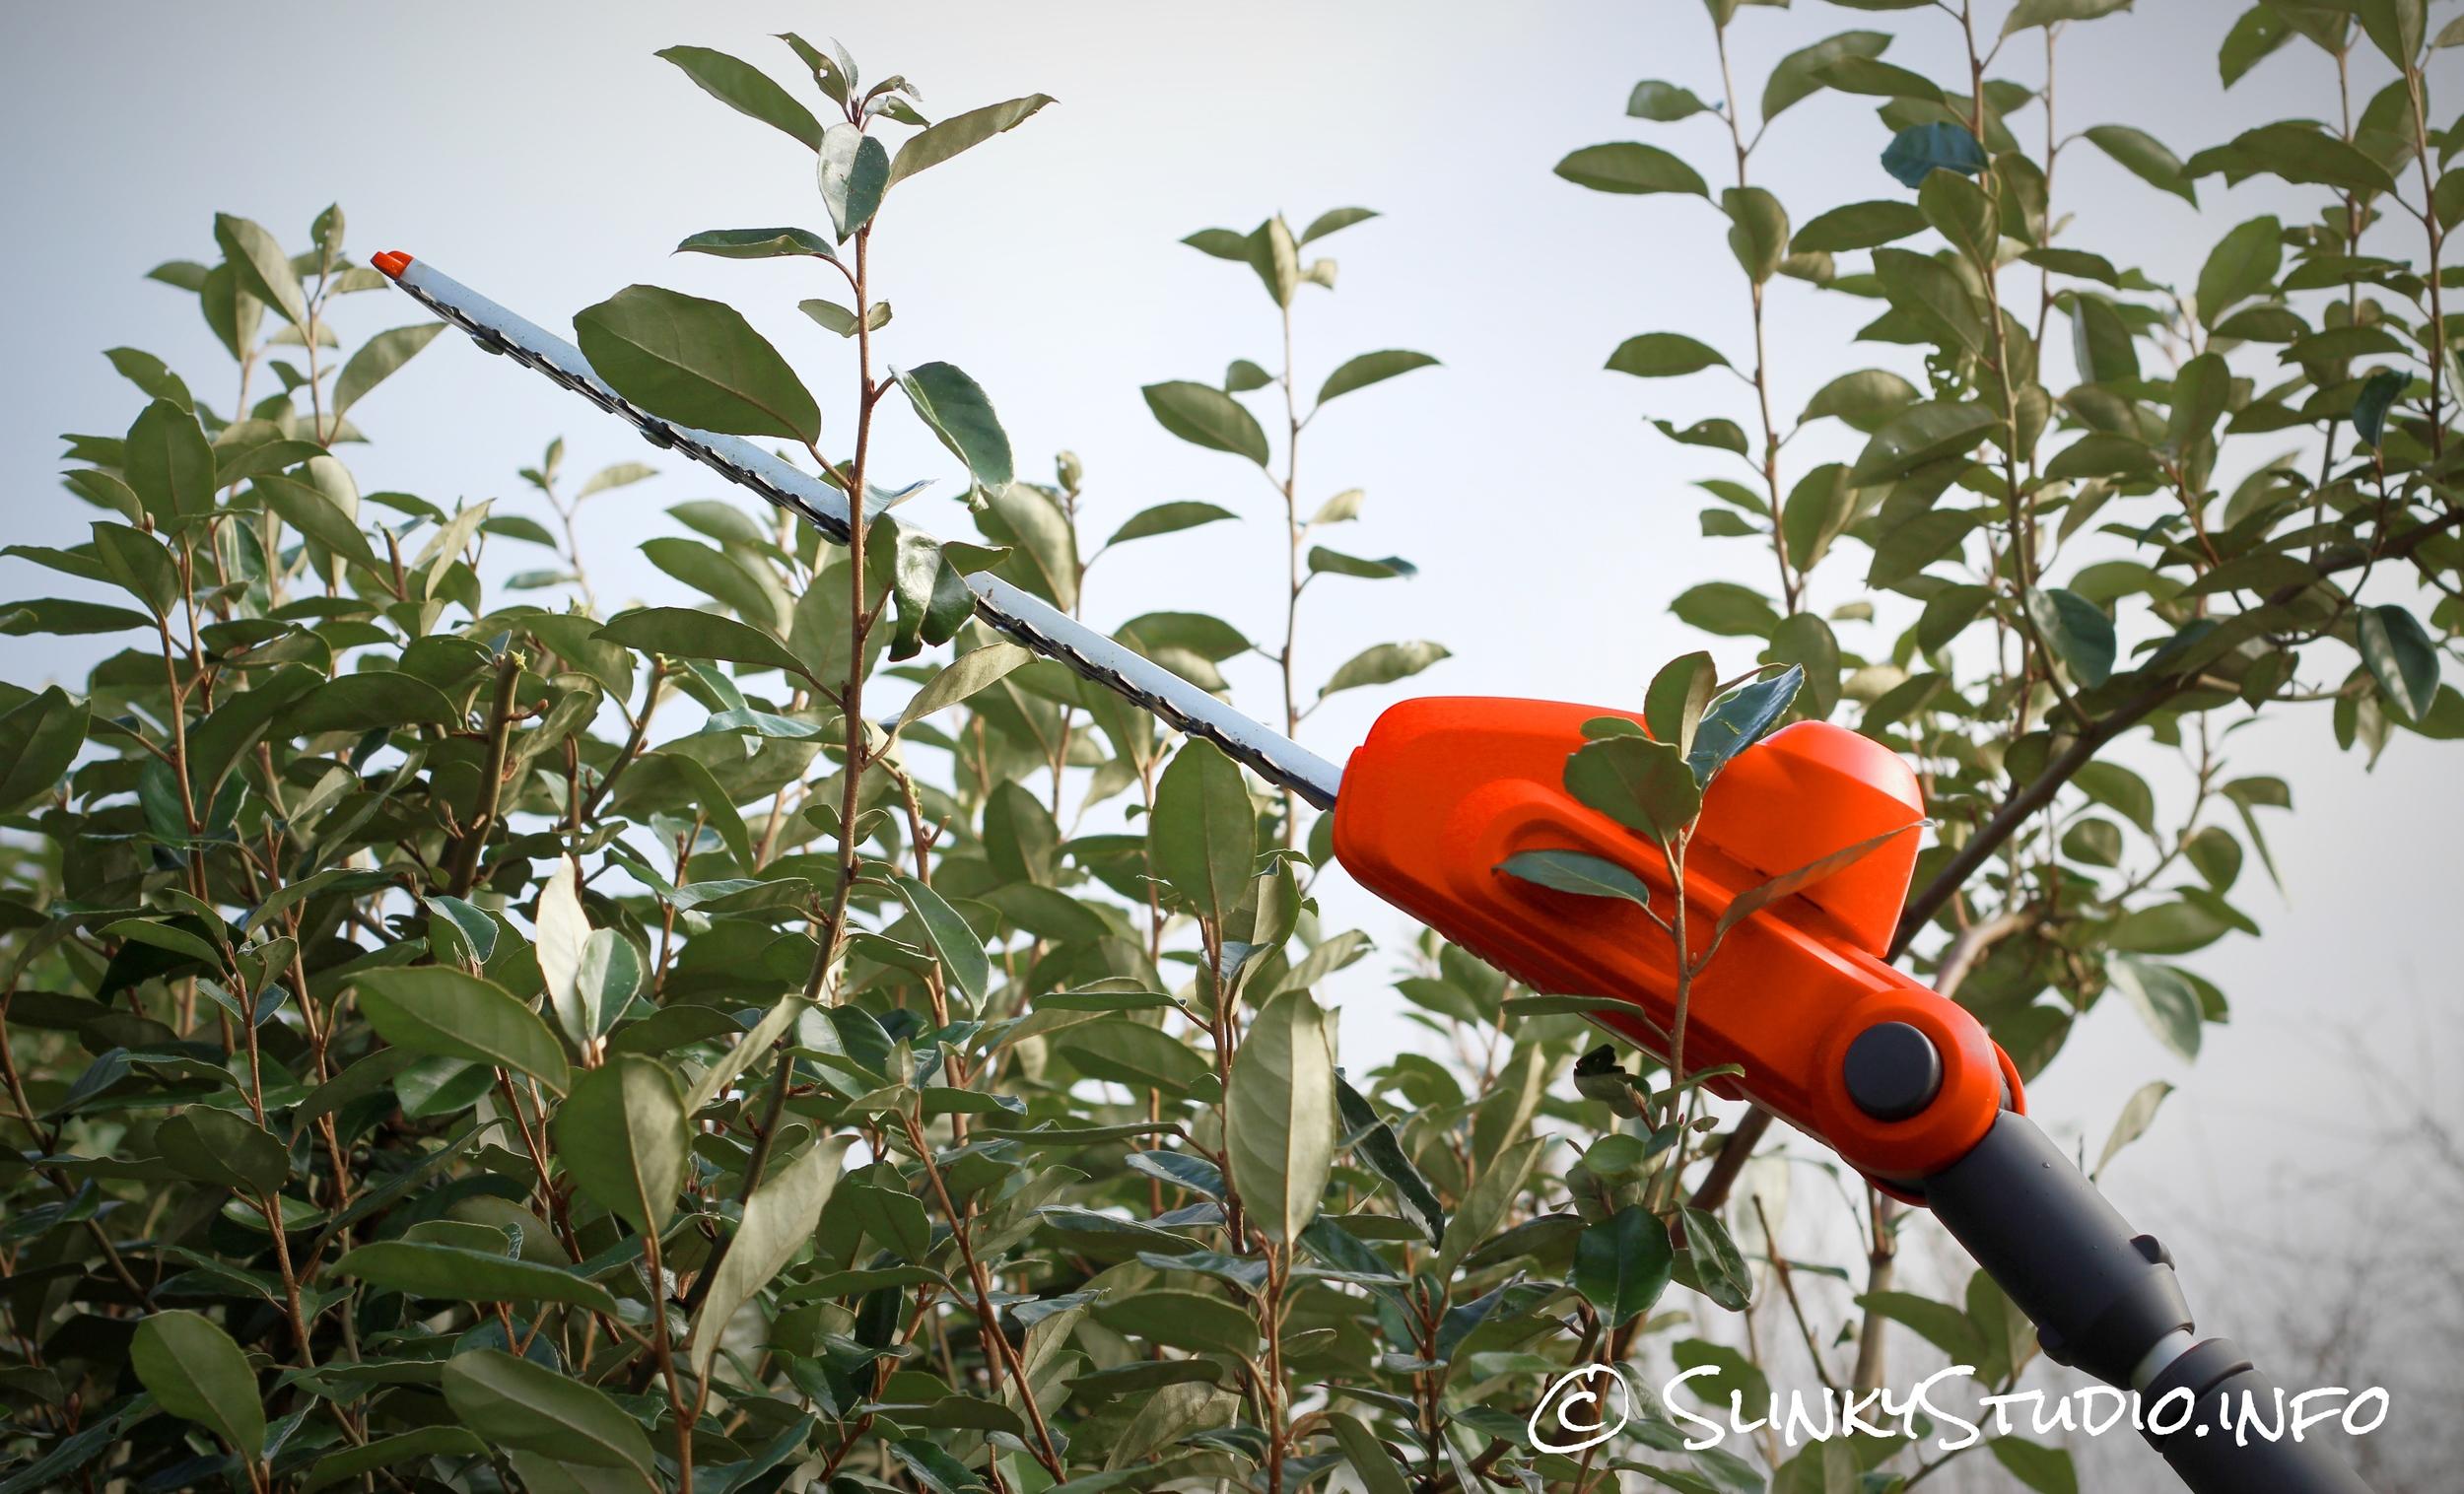 Flymo SabreCut XT Cordless Hedge Trimmer Cutting.jpg